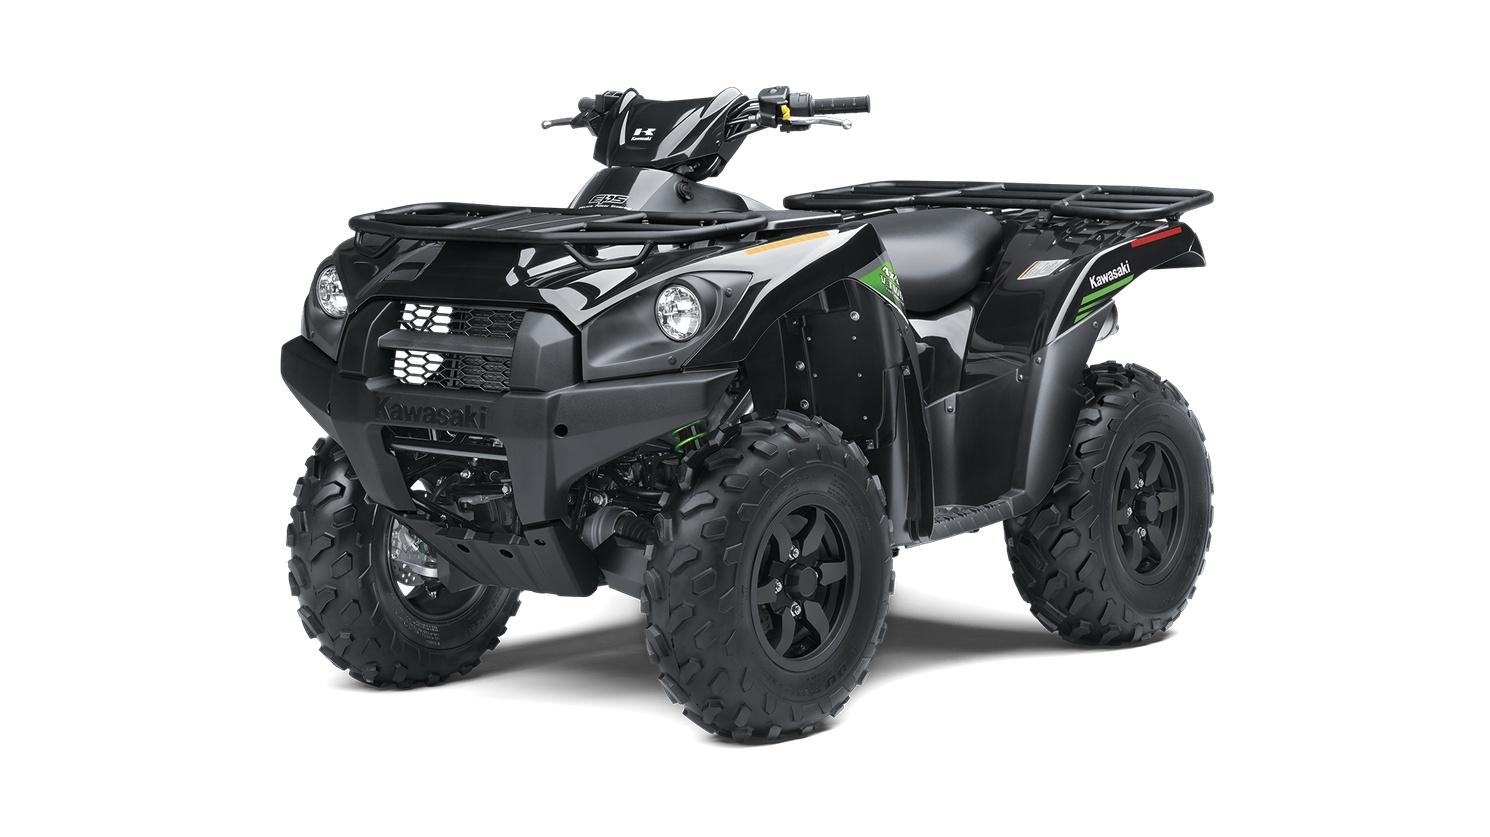 Kawasaki BRUTE FORCE 750 4x4i EPS Noir Intense 2020